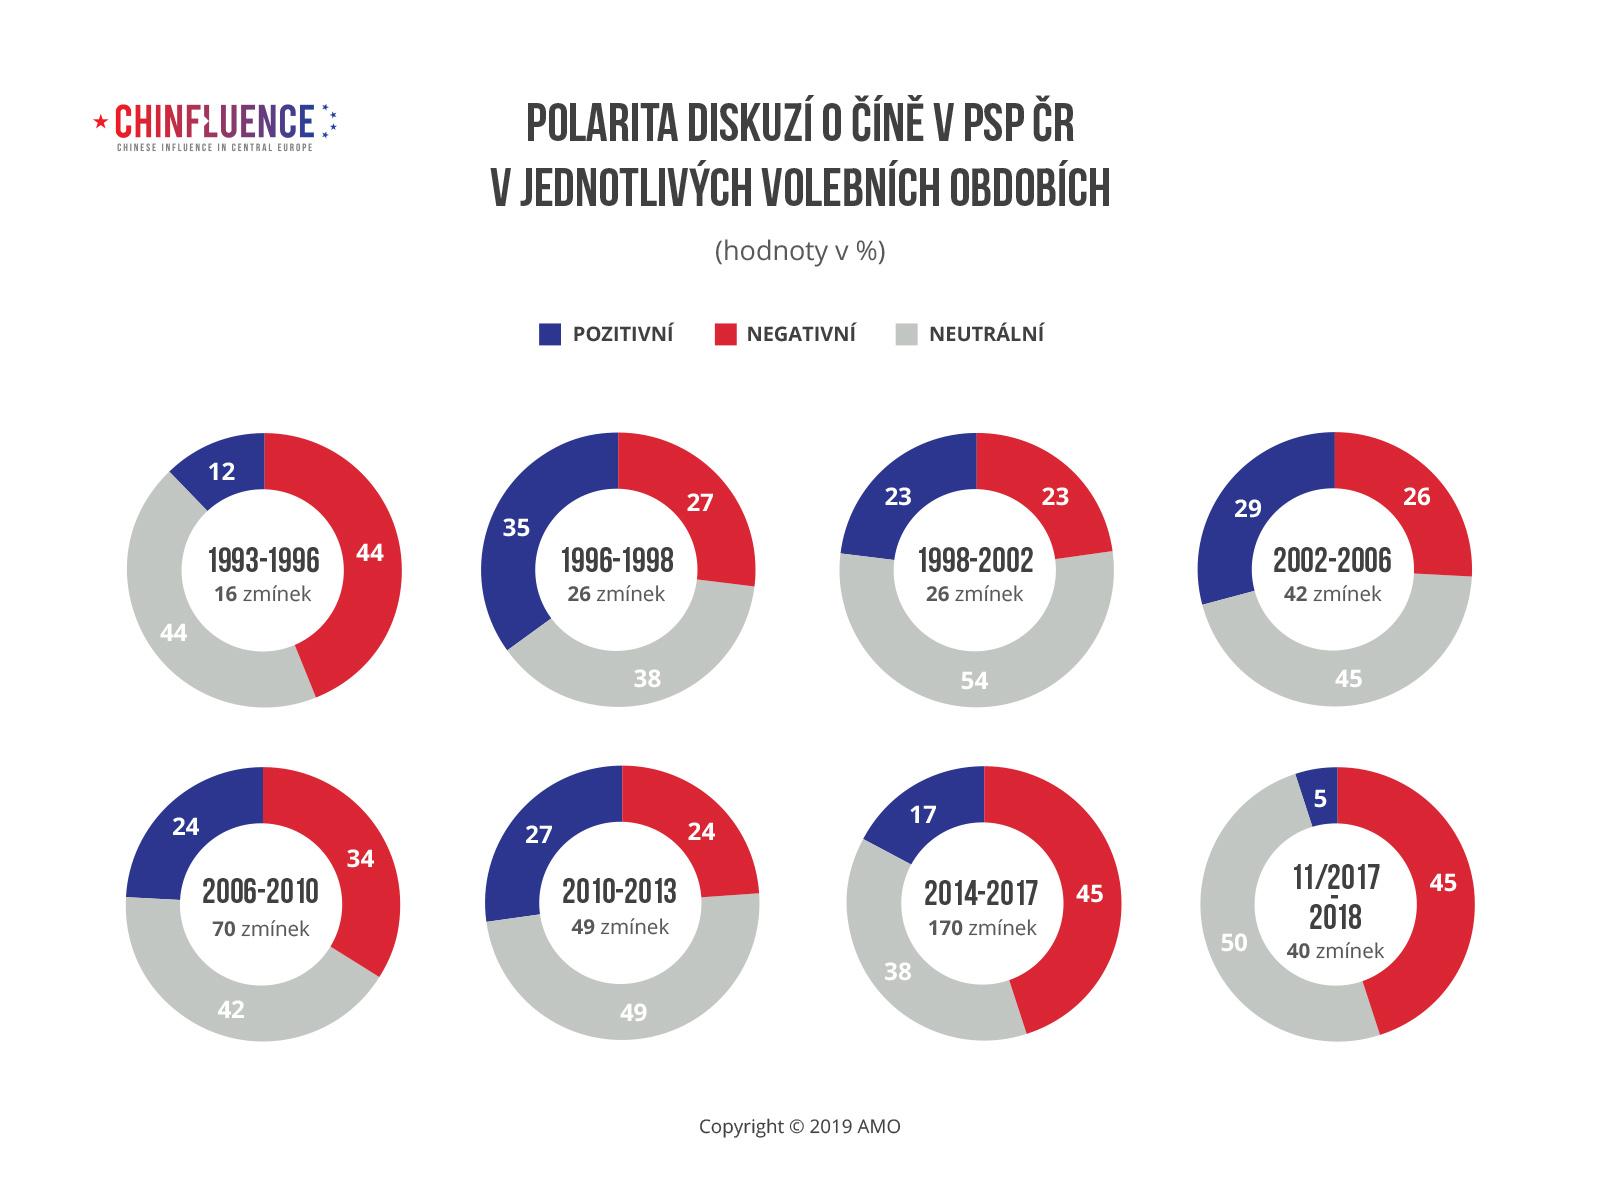 Polarita diskuzi o Cine v PSP CR v jednotlivych volebnich obdobich_8 grafu_procenta